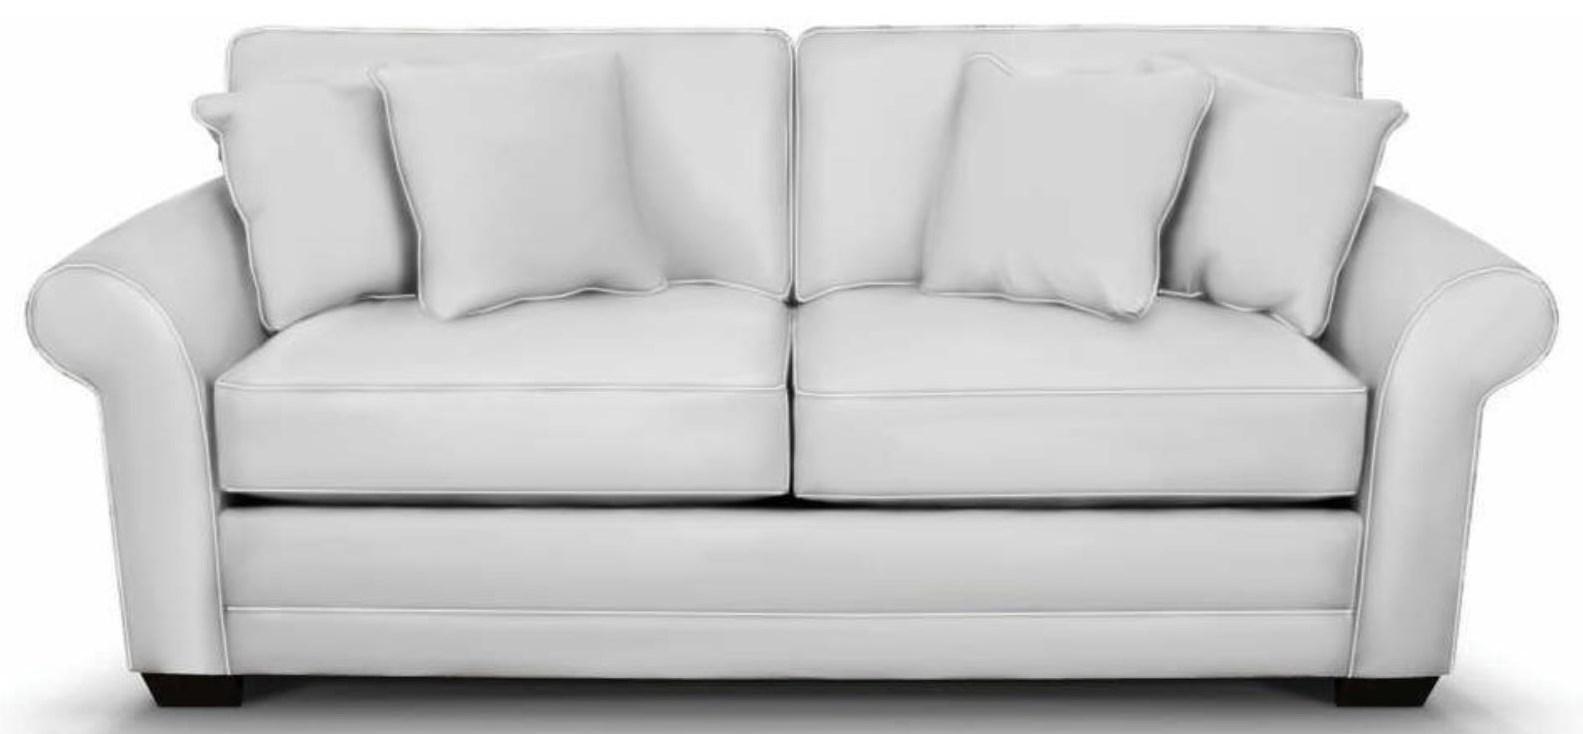 England Brantley Traditional Rolled Arm Queen Sleeper Sofa Reeds Furniture Sleeper Sofas